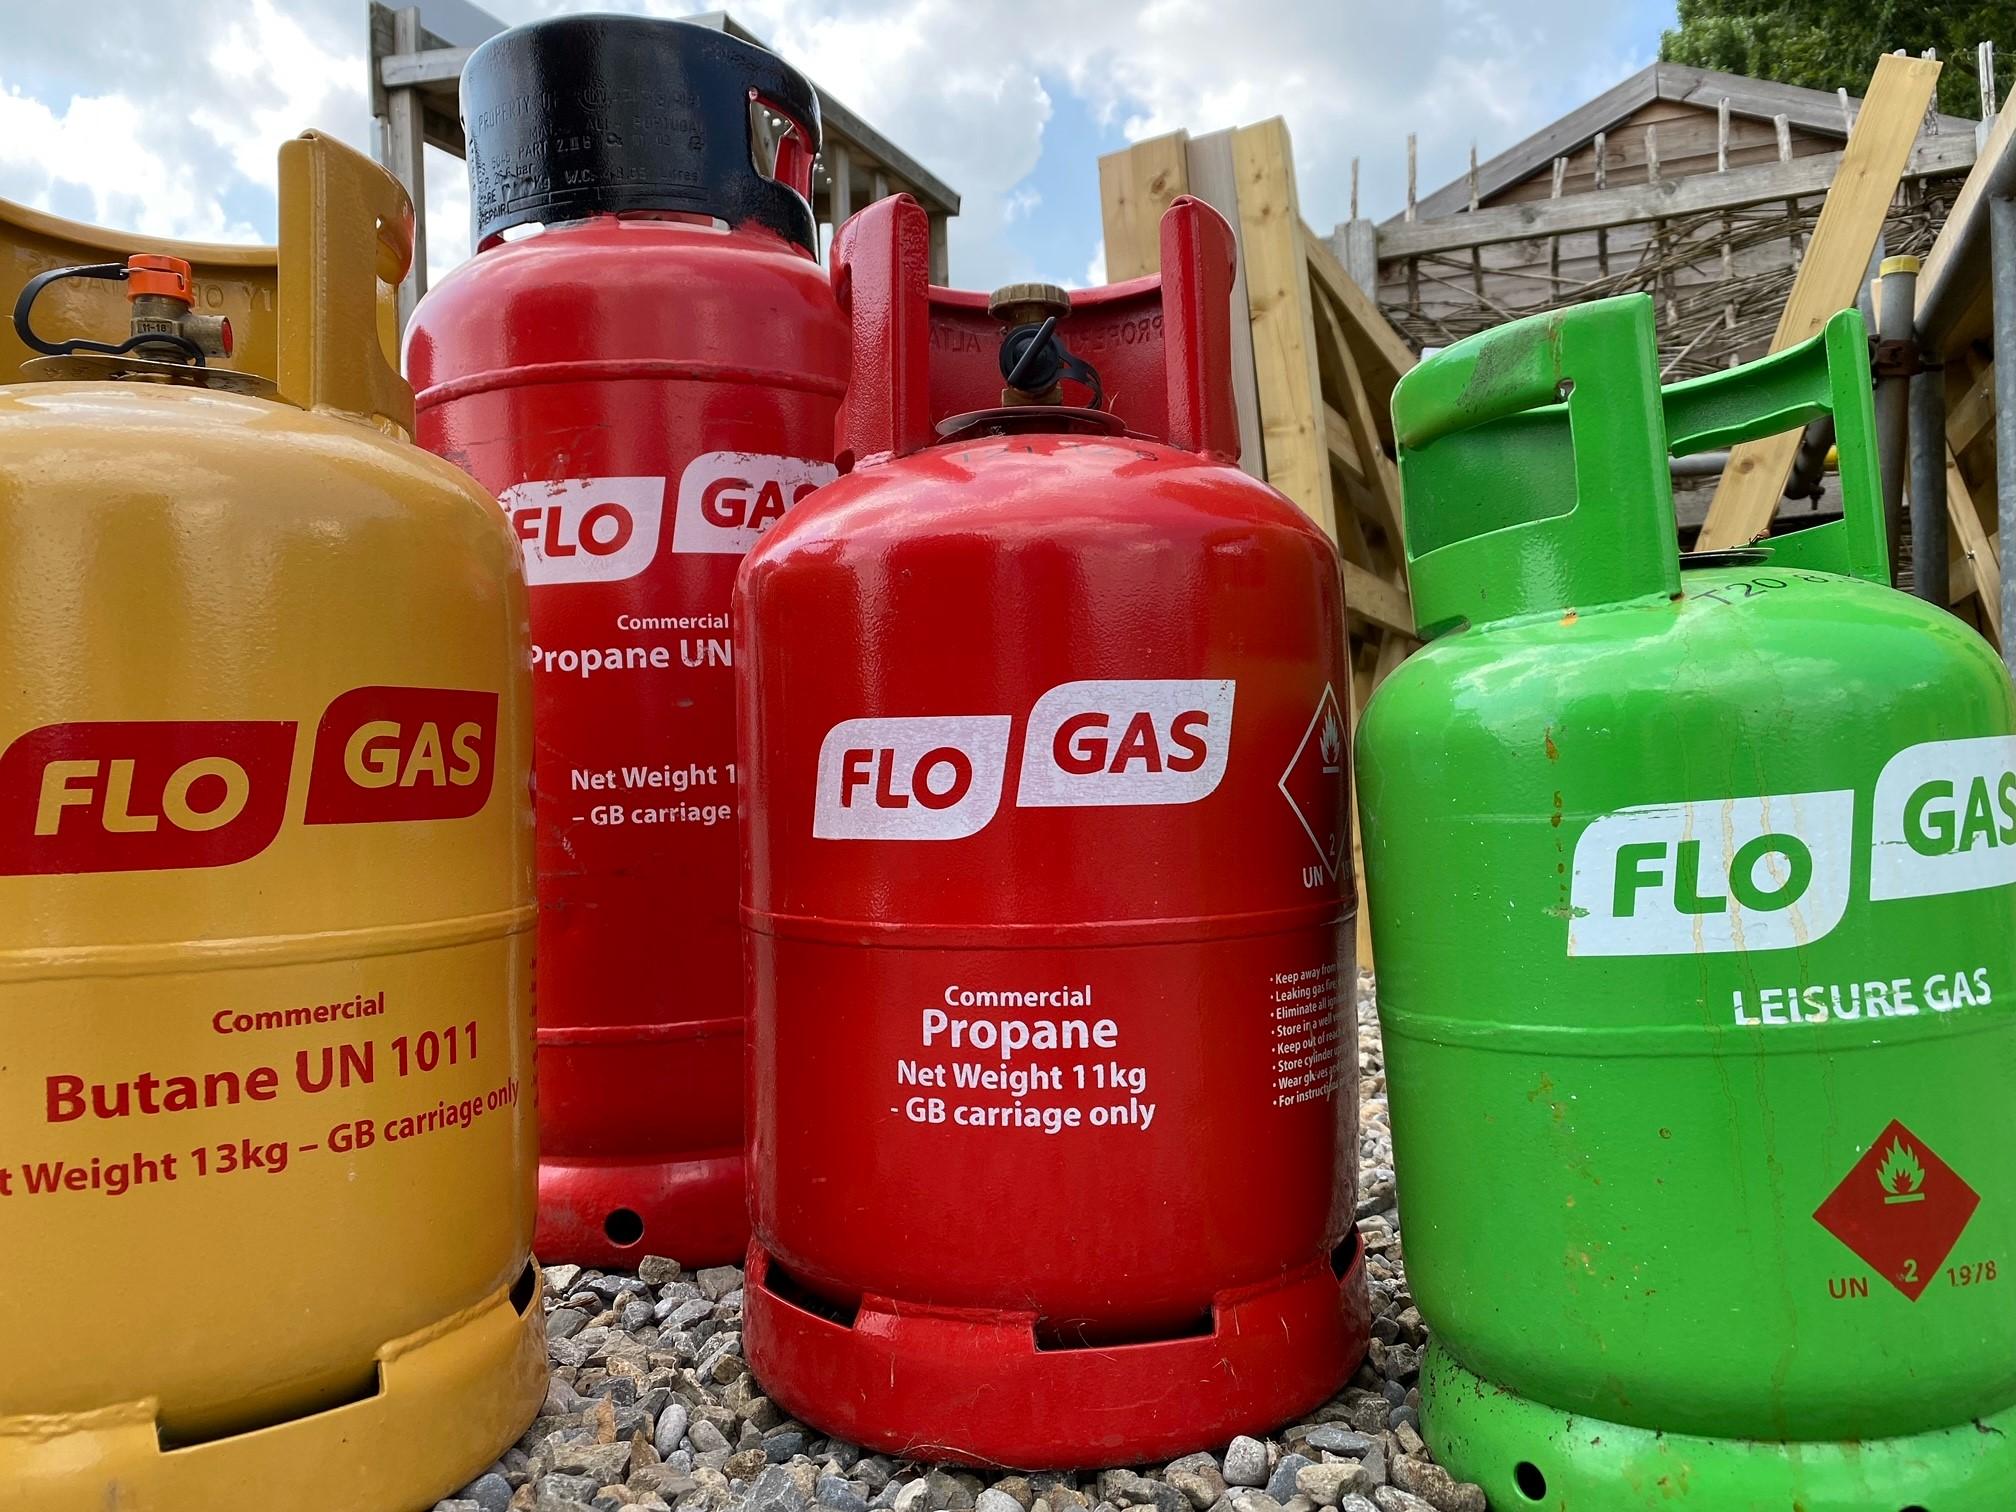 Gas (Propane & Butane)